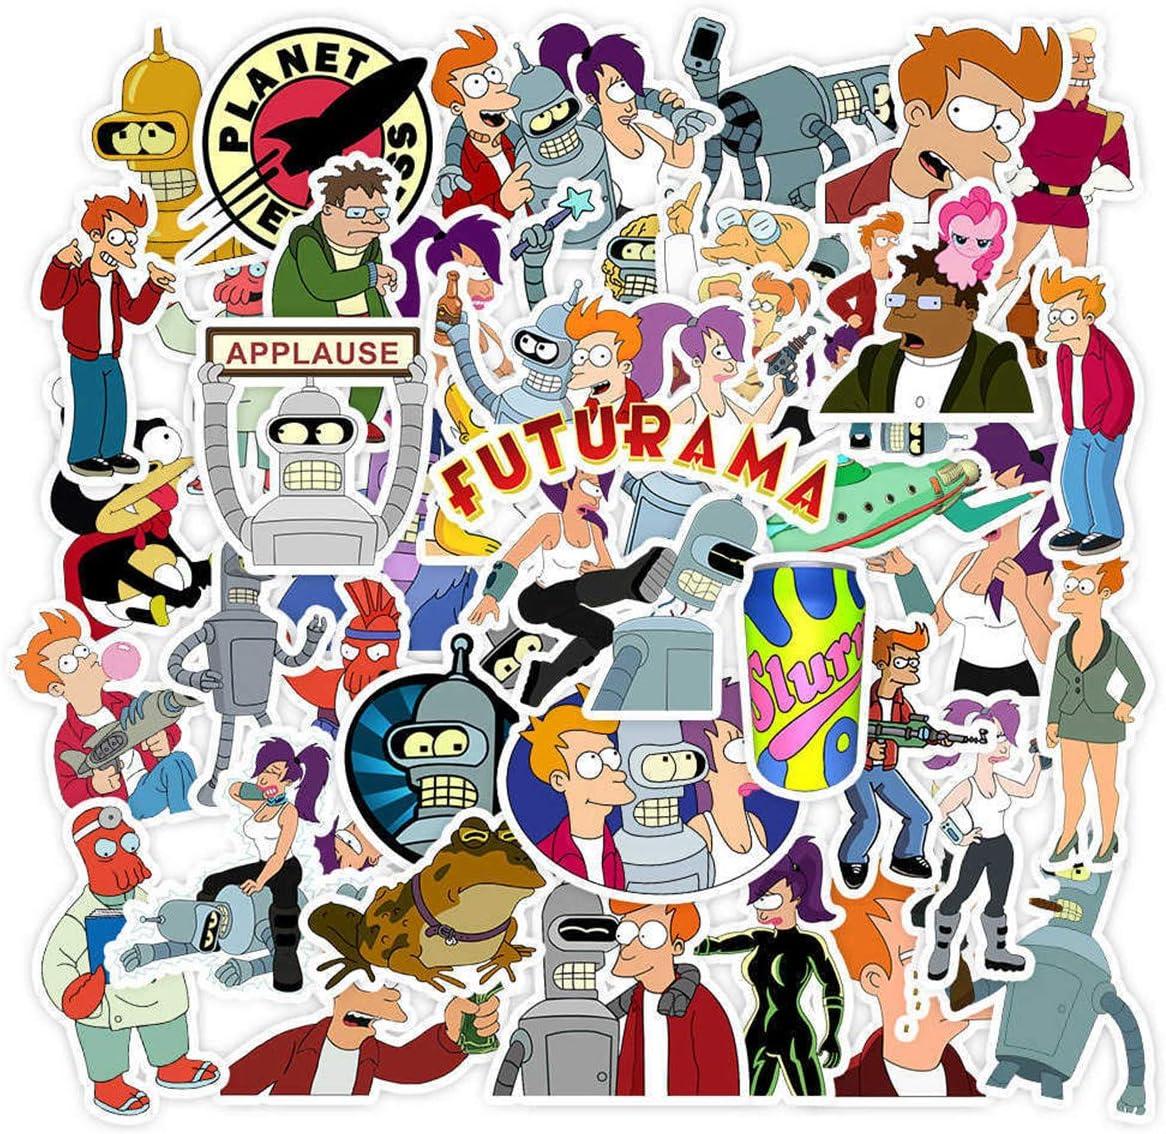 Turanga Leel Futurama Stickers Aloa Mars Philip J. Fry Sticker for Kids Laptop Skateboard Toy Stickers (Futurama)